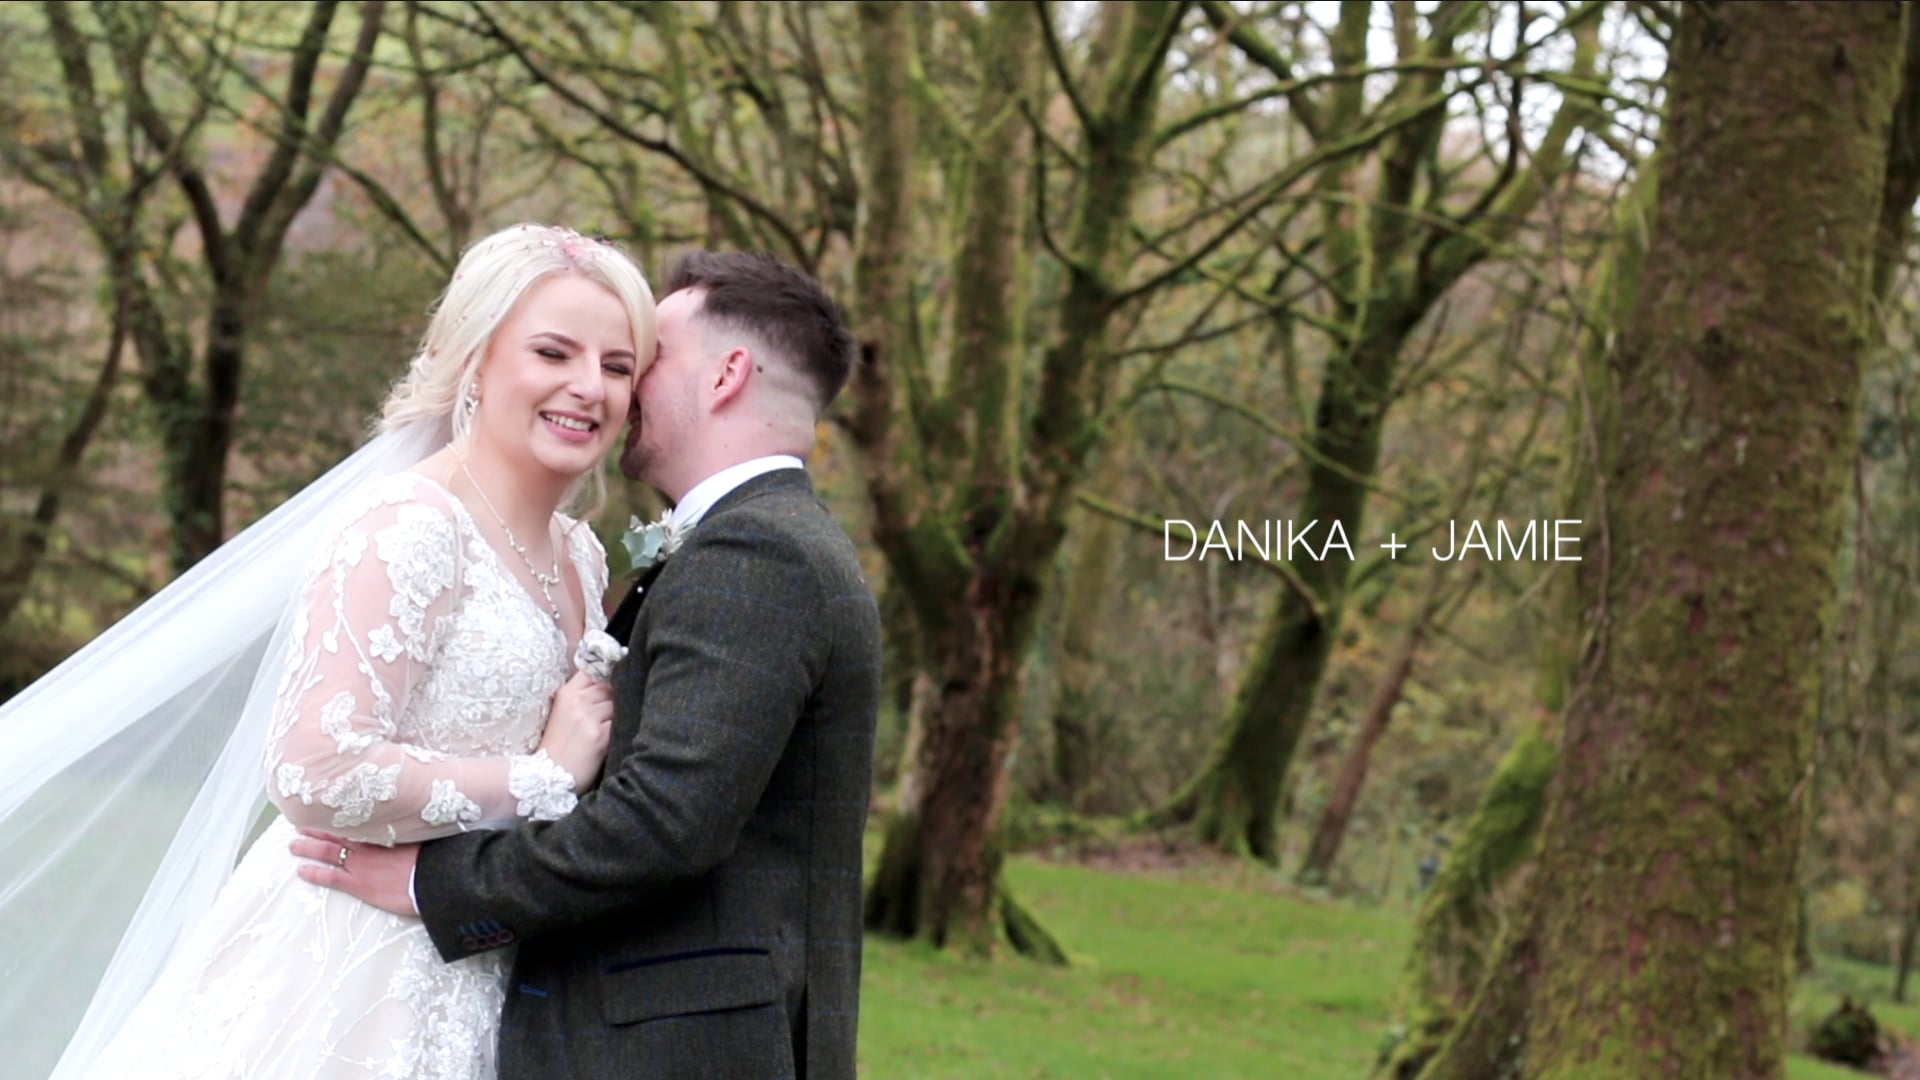 Danika + Jamie